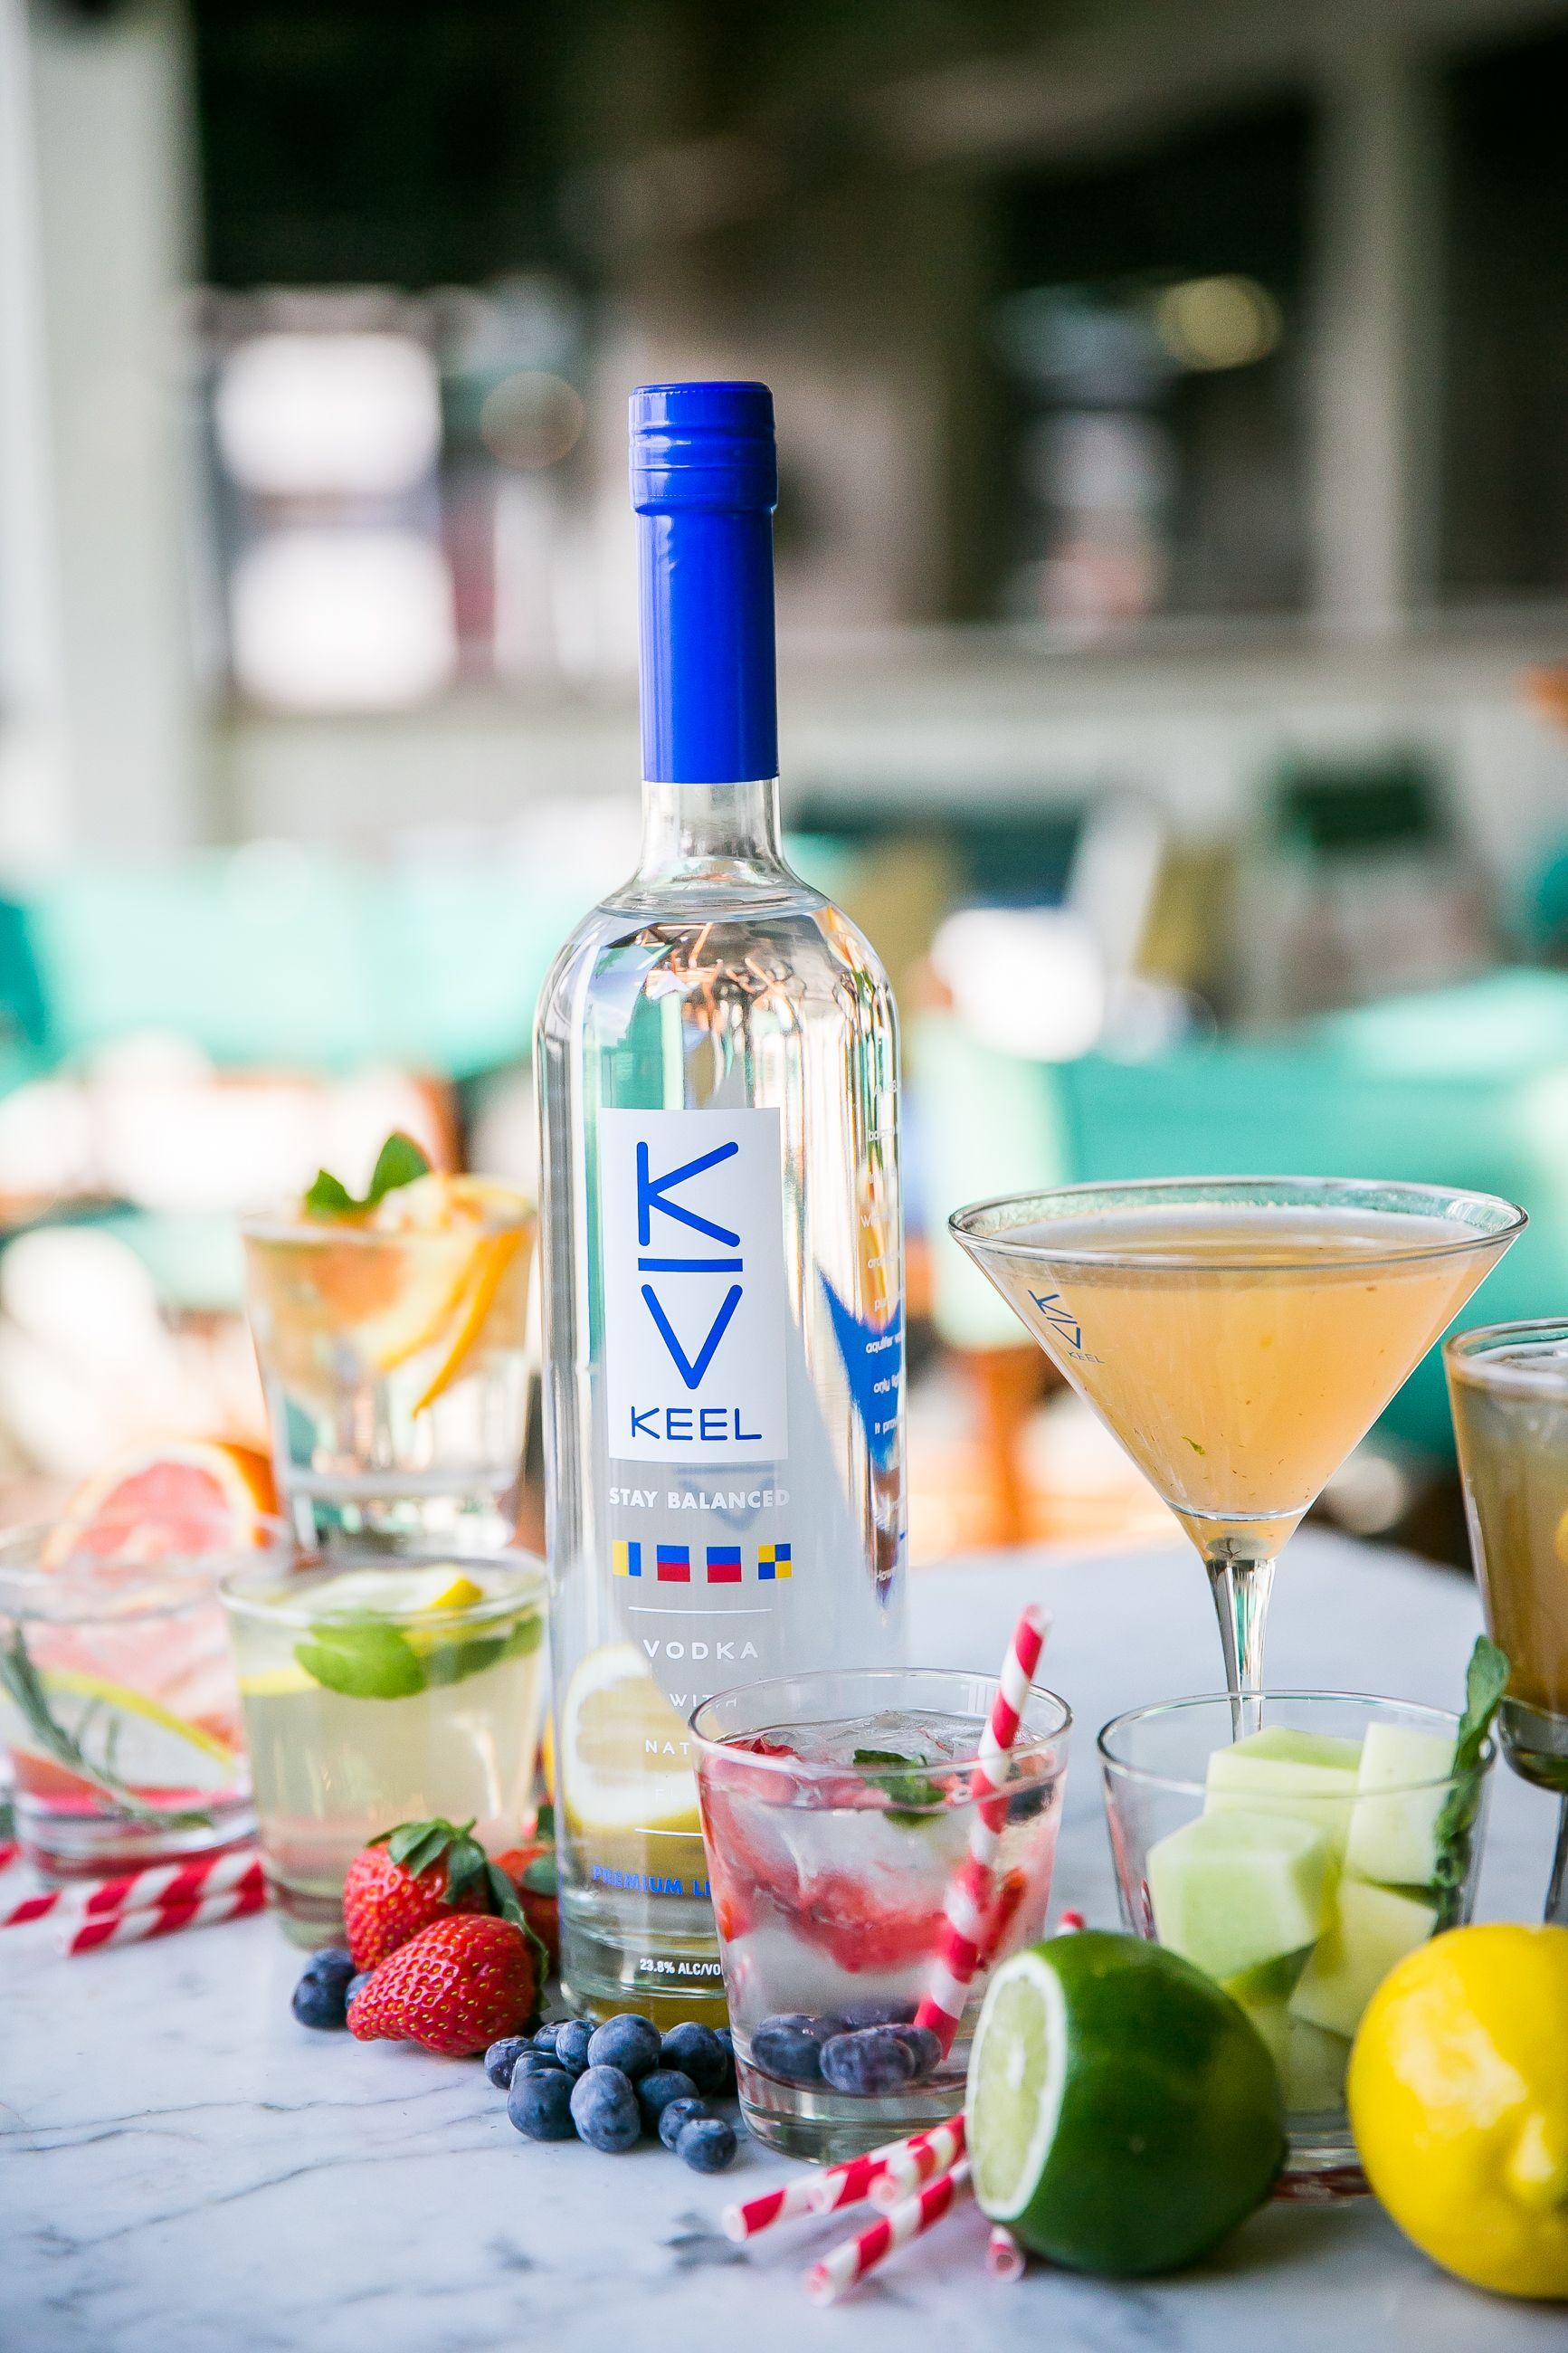 KEEL Vodka: The lightest spirit on the market  58 Calories